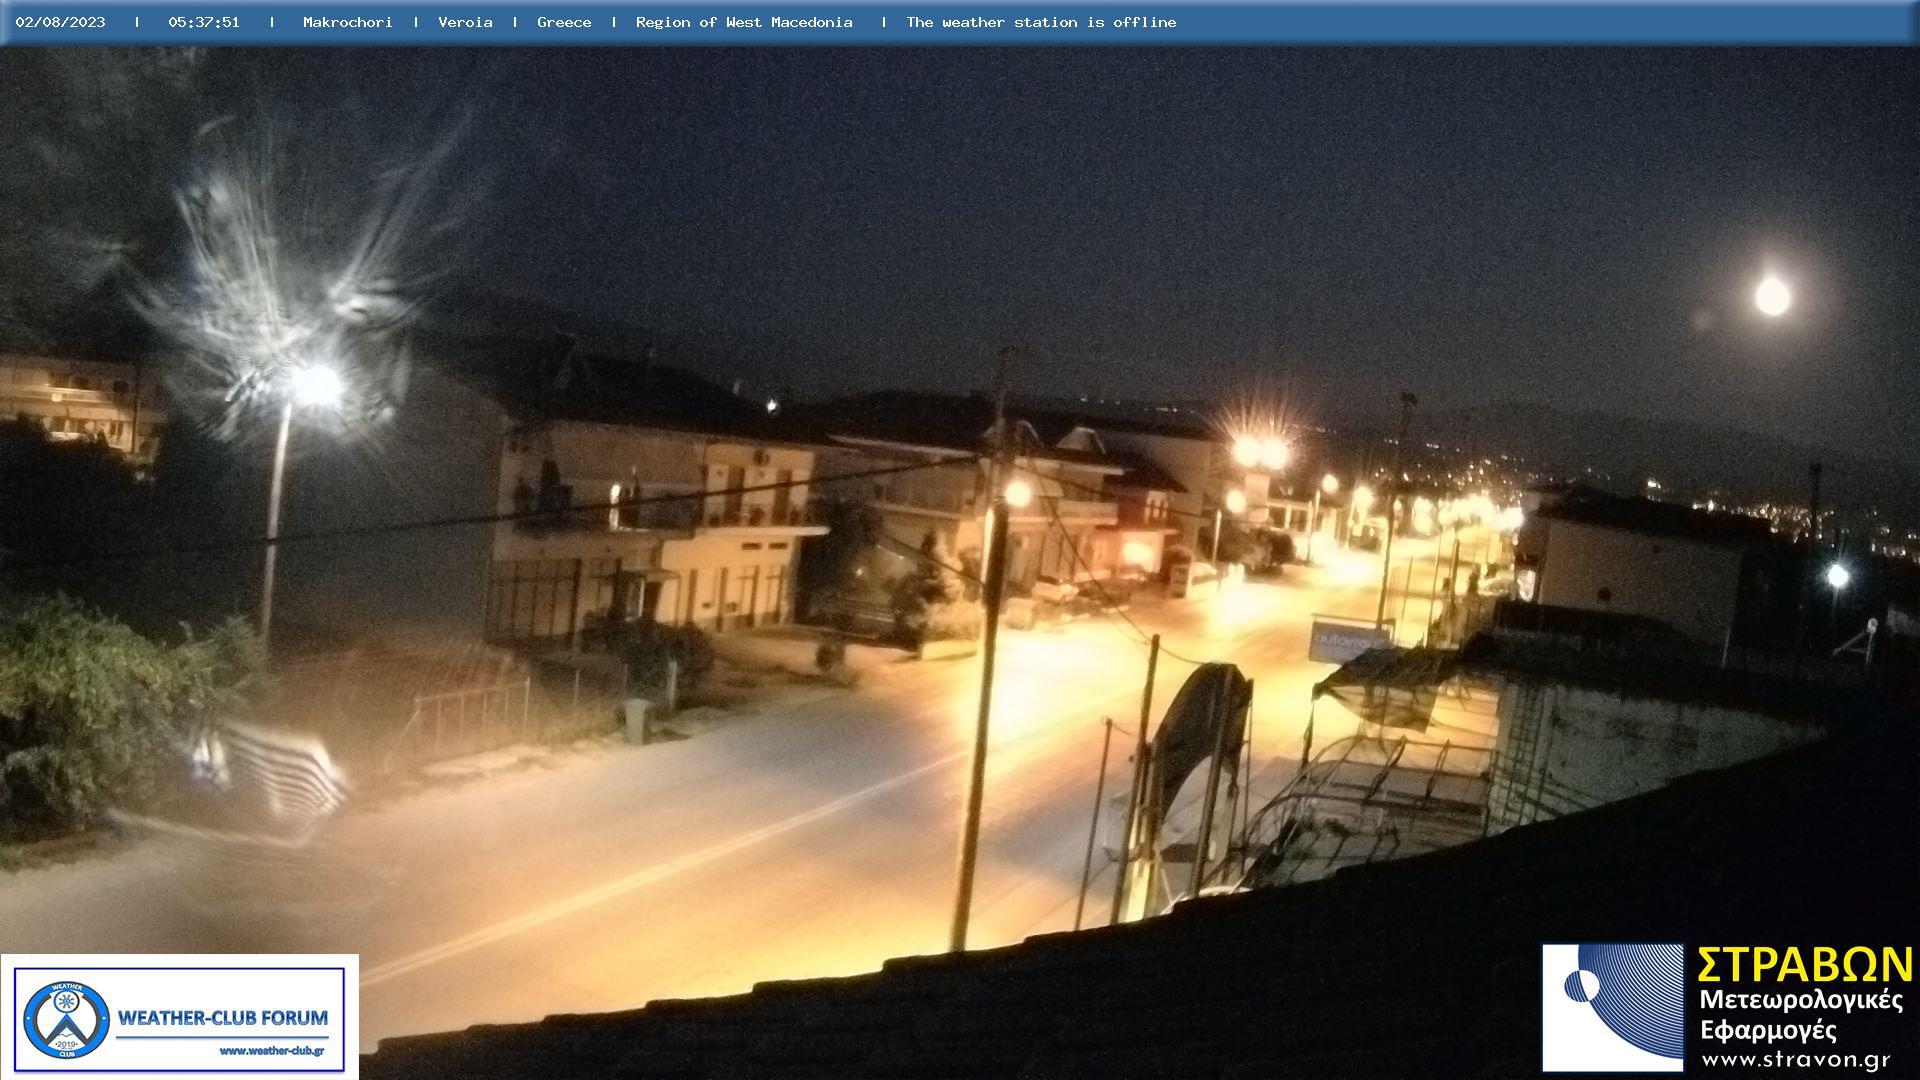 Webcam Μακροχώρι Βέροιας